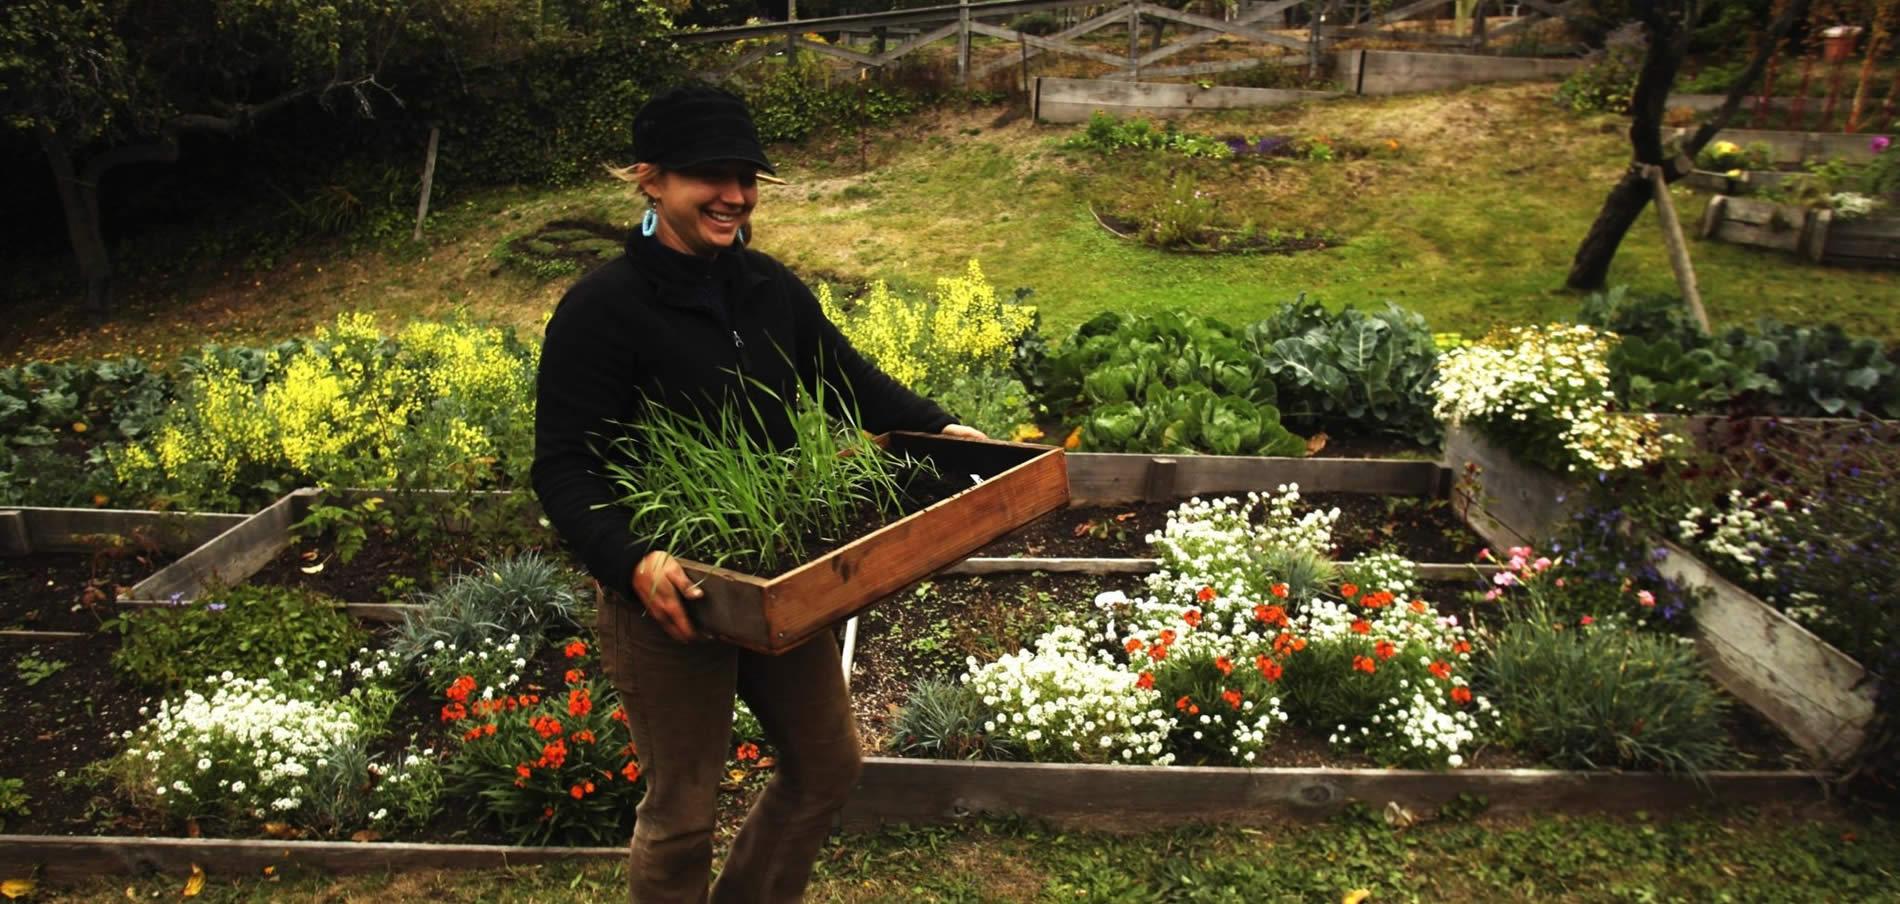 mendocino stanford inn environmental field school